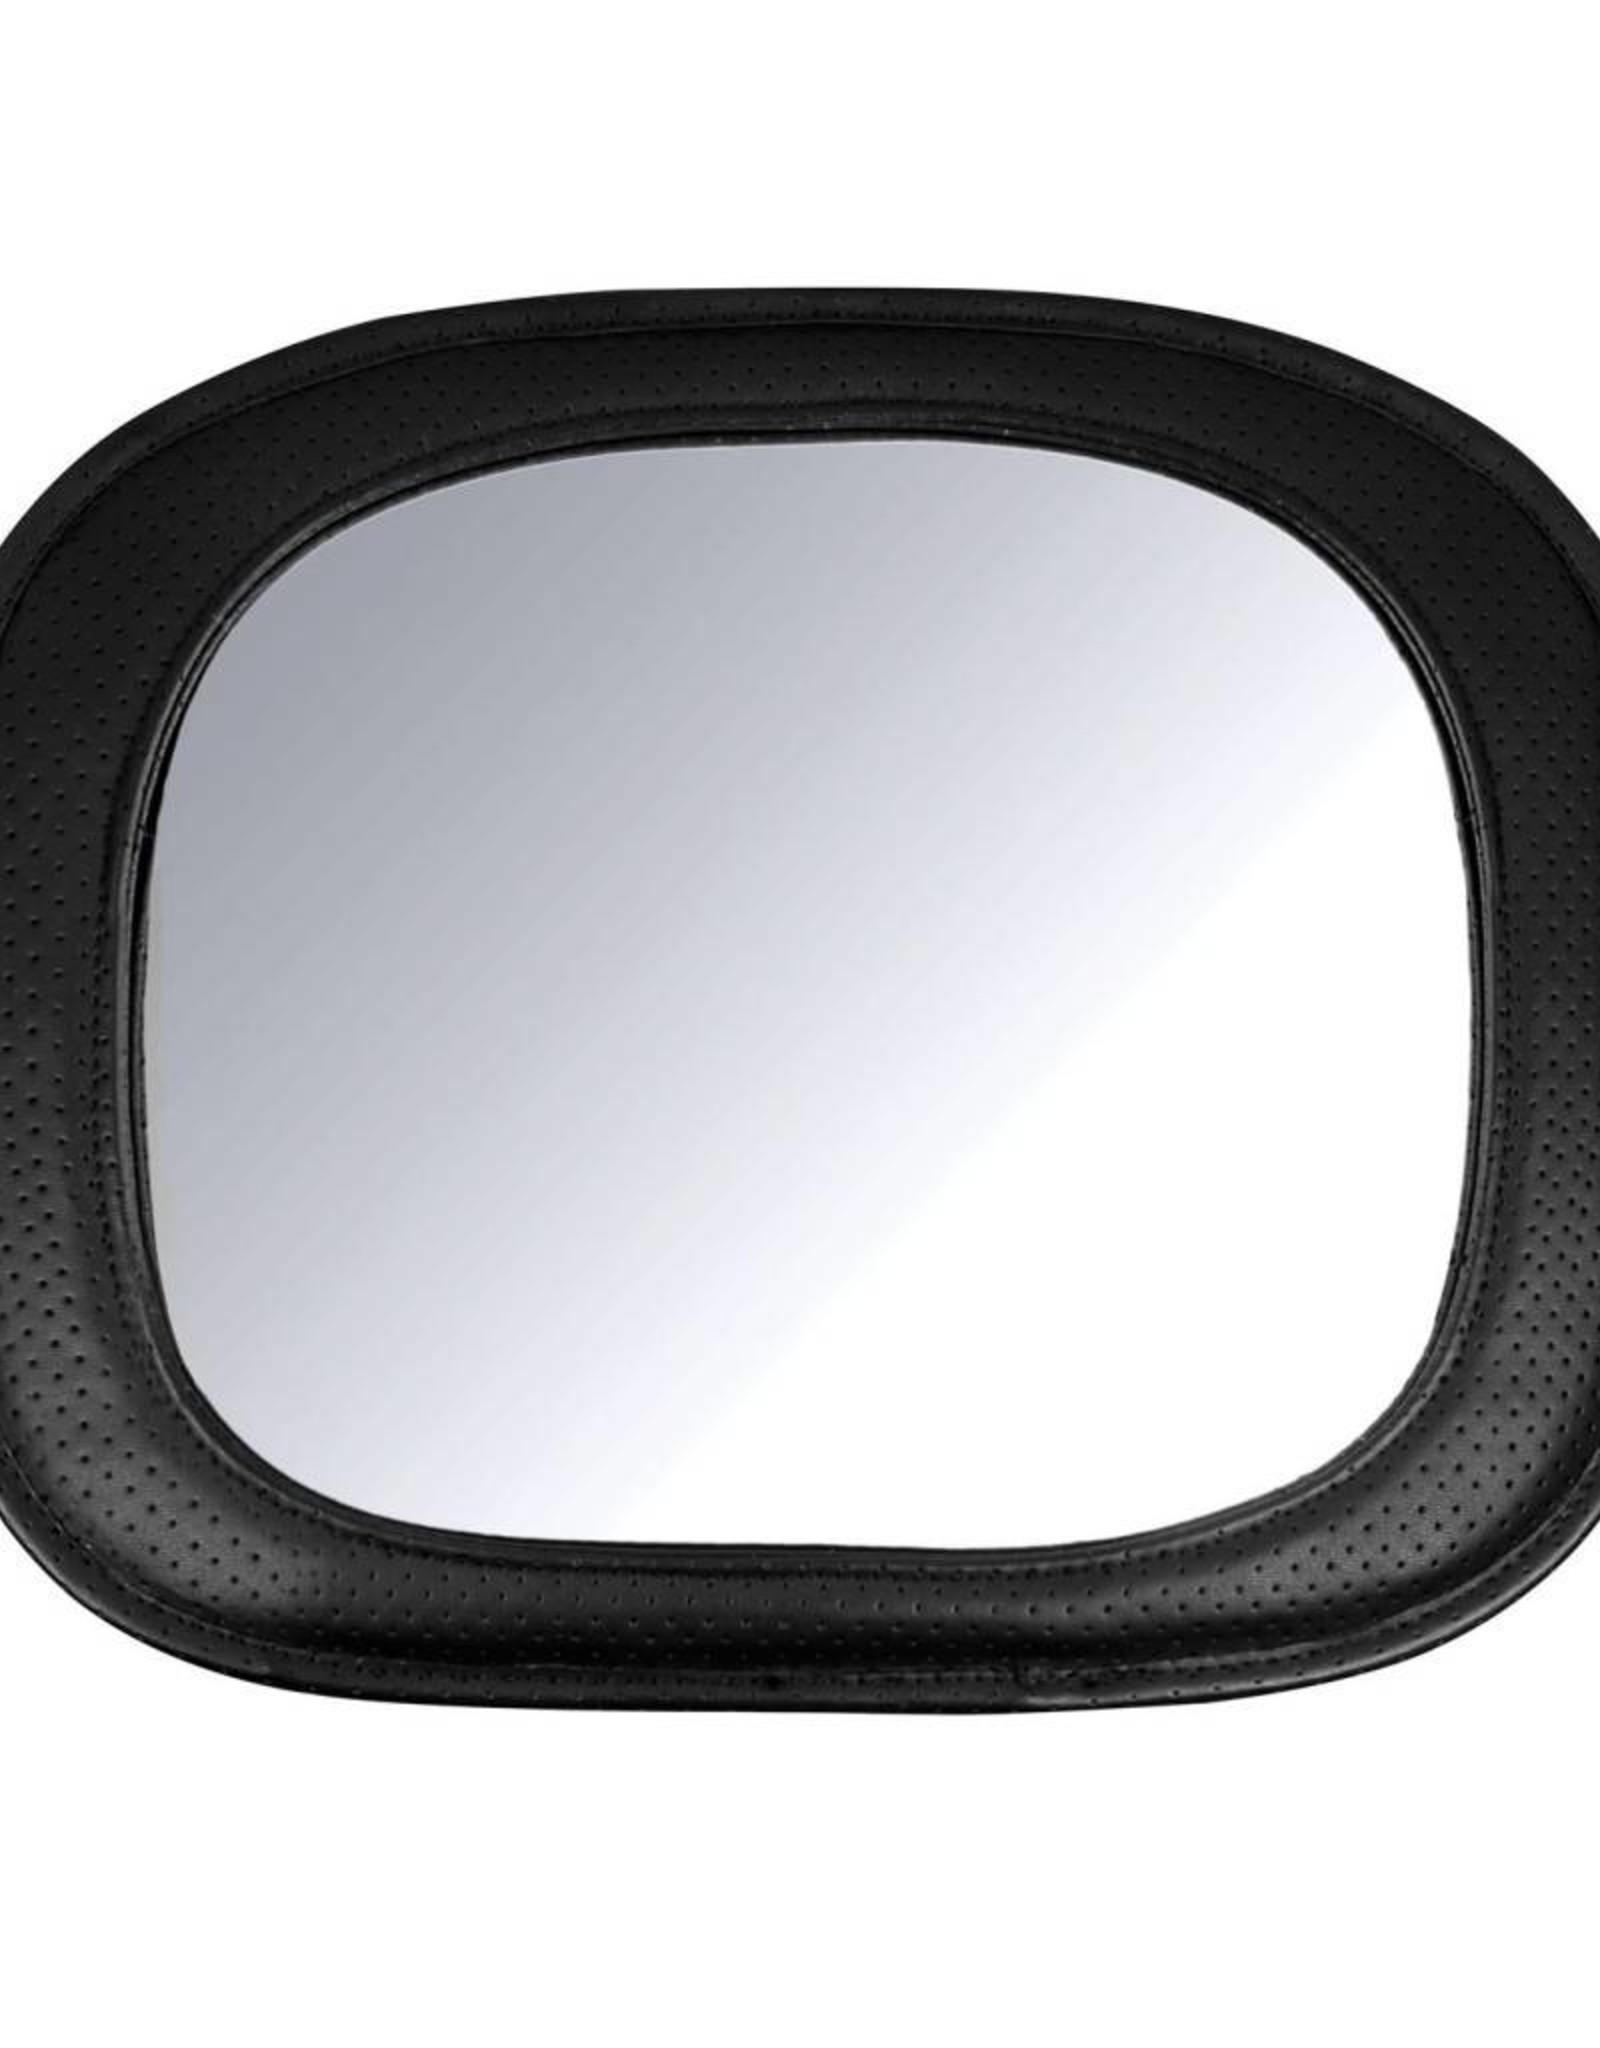 Skip Hop Skip Hop Back Seat Mirror